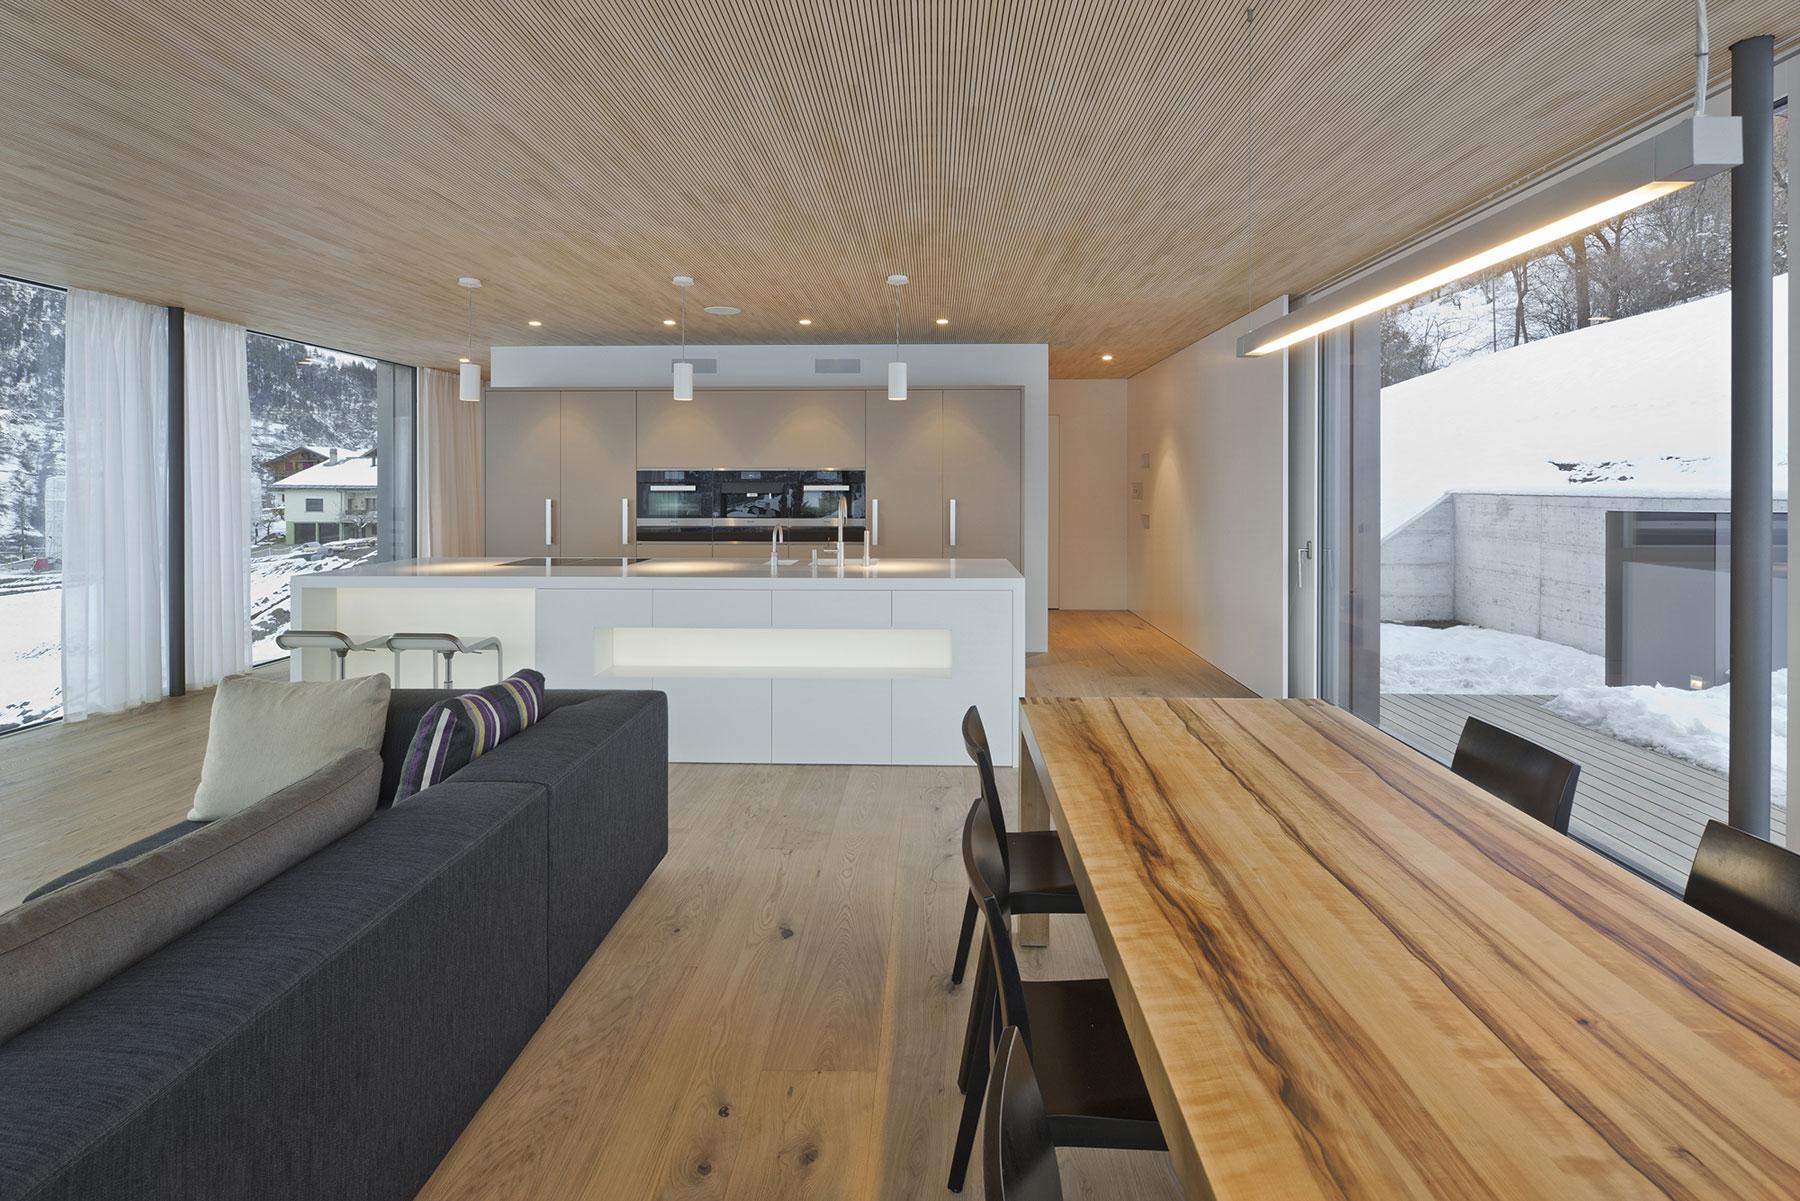 A HI-MACS House In Termen by Zeiter Berchtold-09